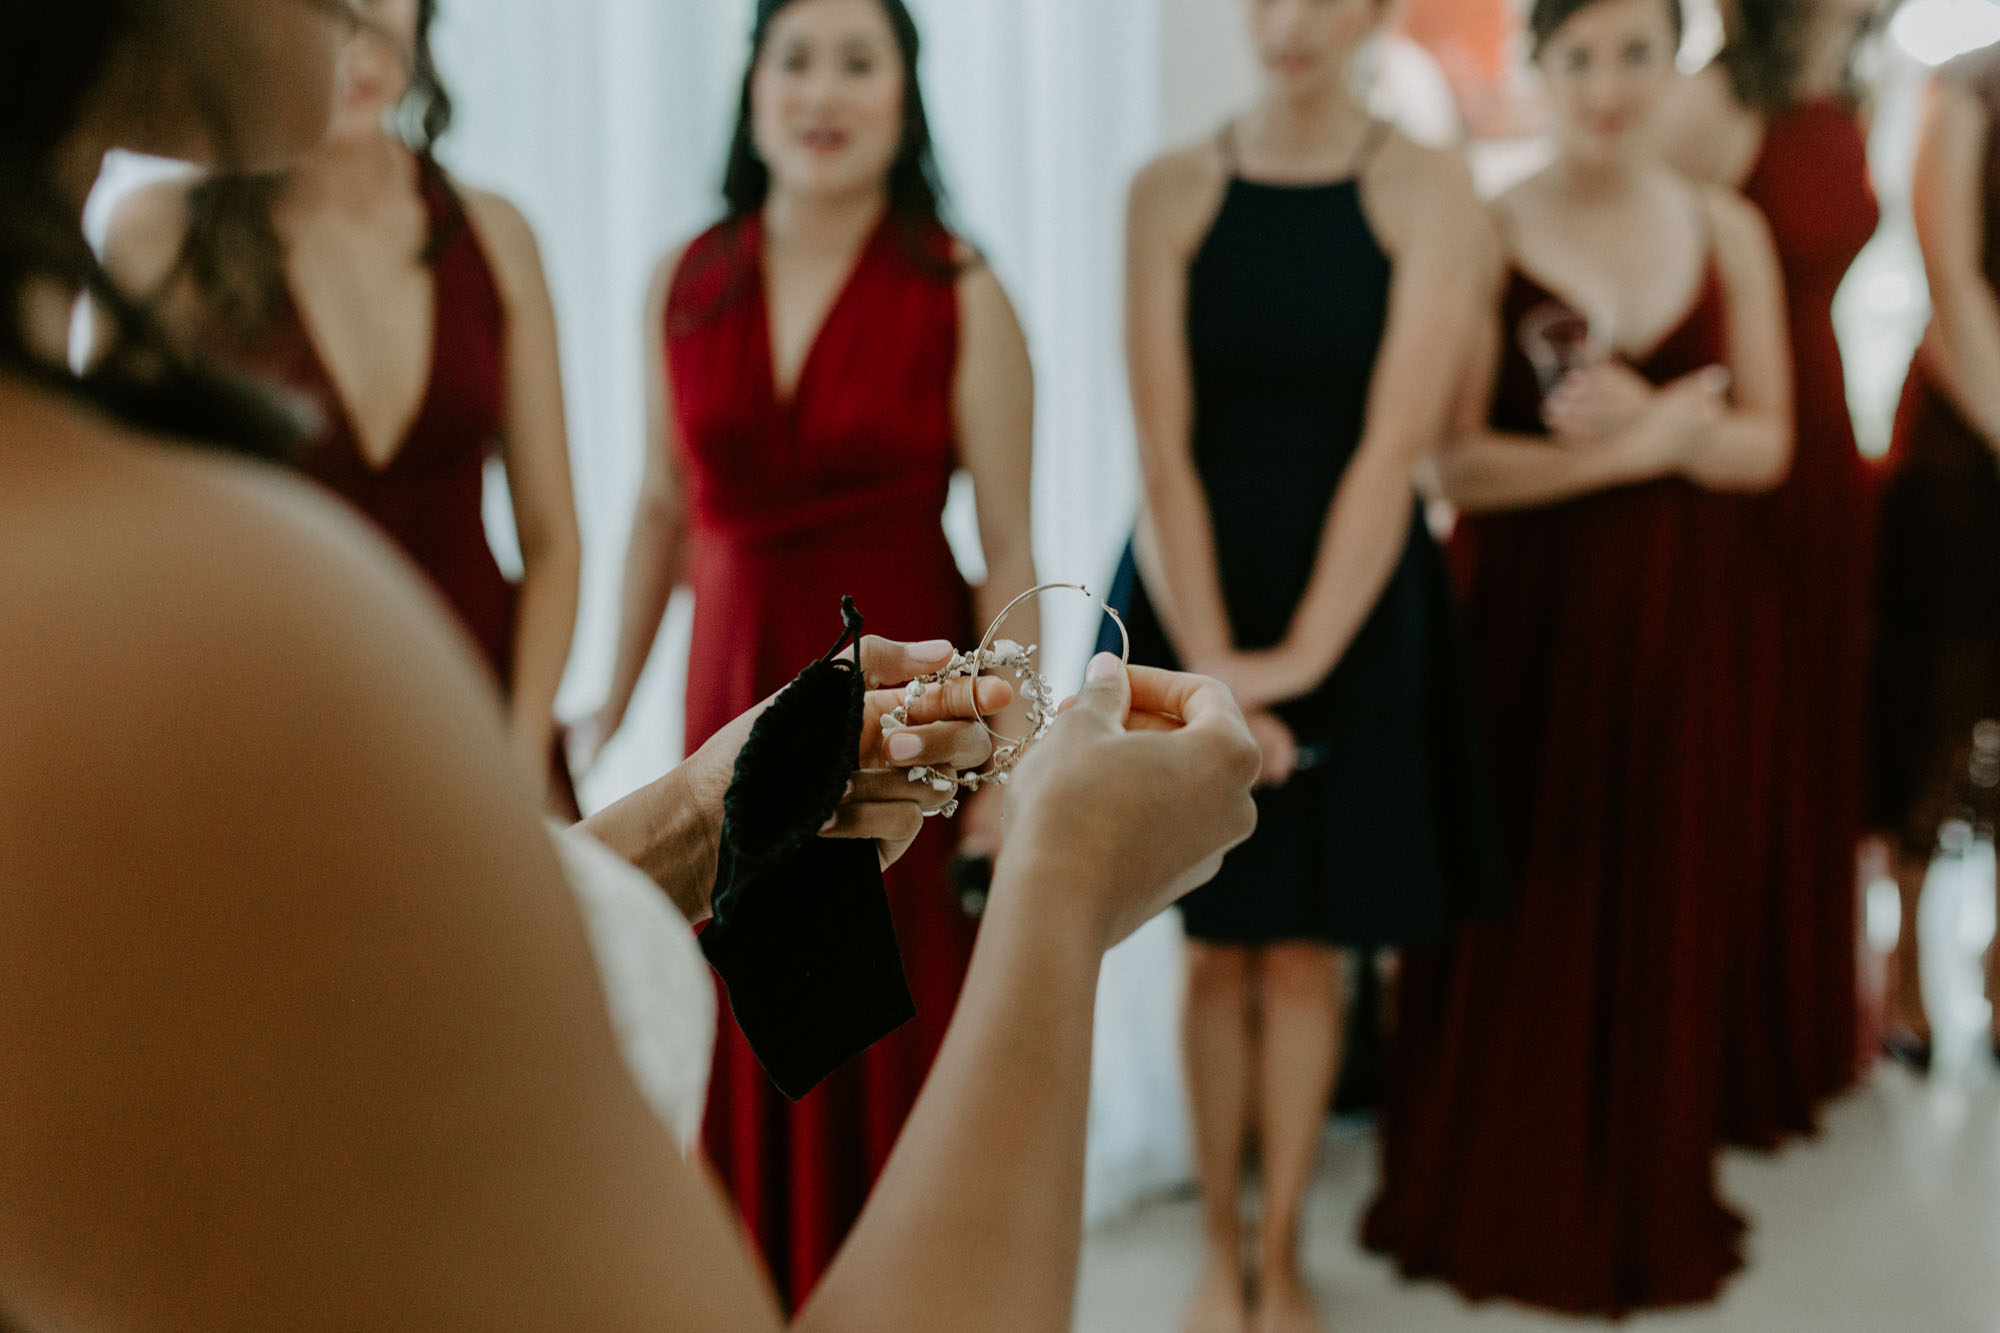 prairie_glass_house_wedding_champaign_wright_photographs_simon_0015.jpg